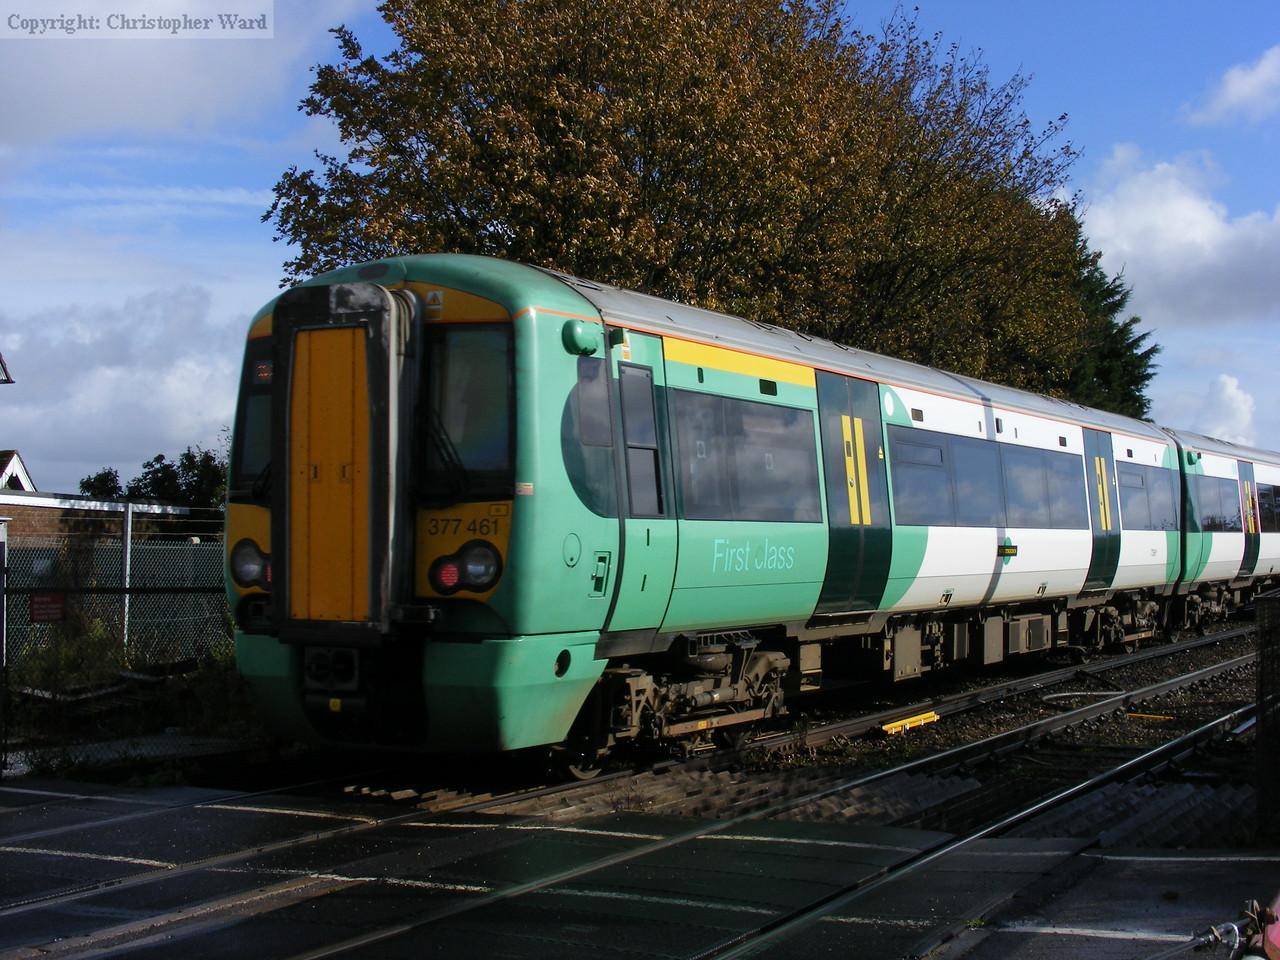 377461 for Brighton